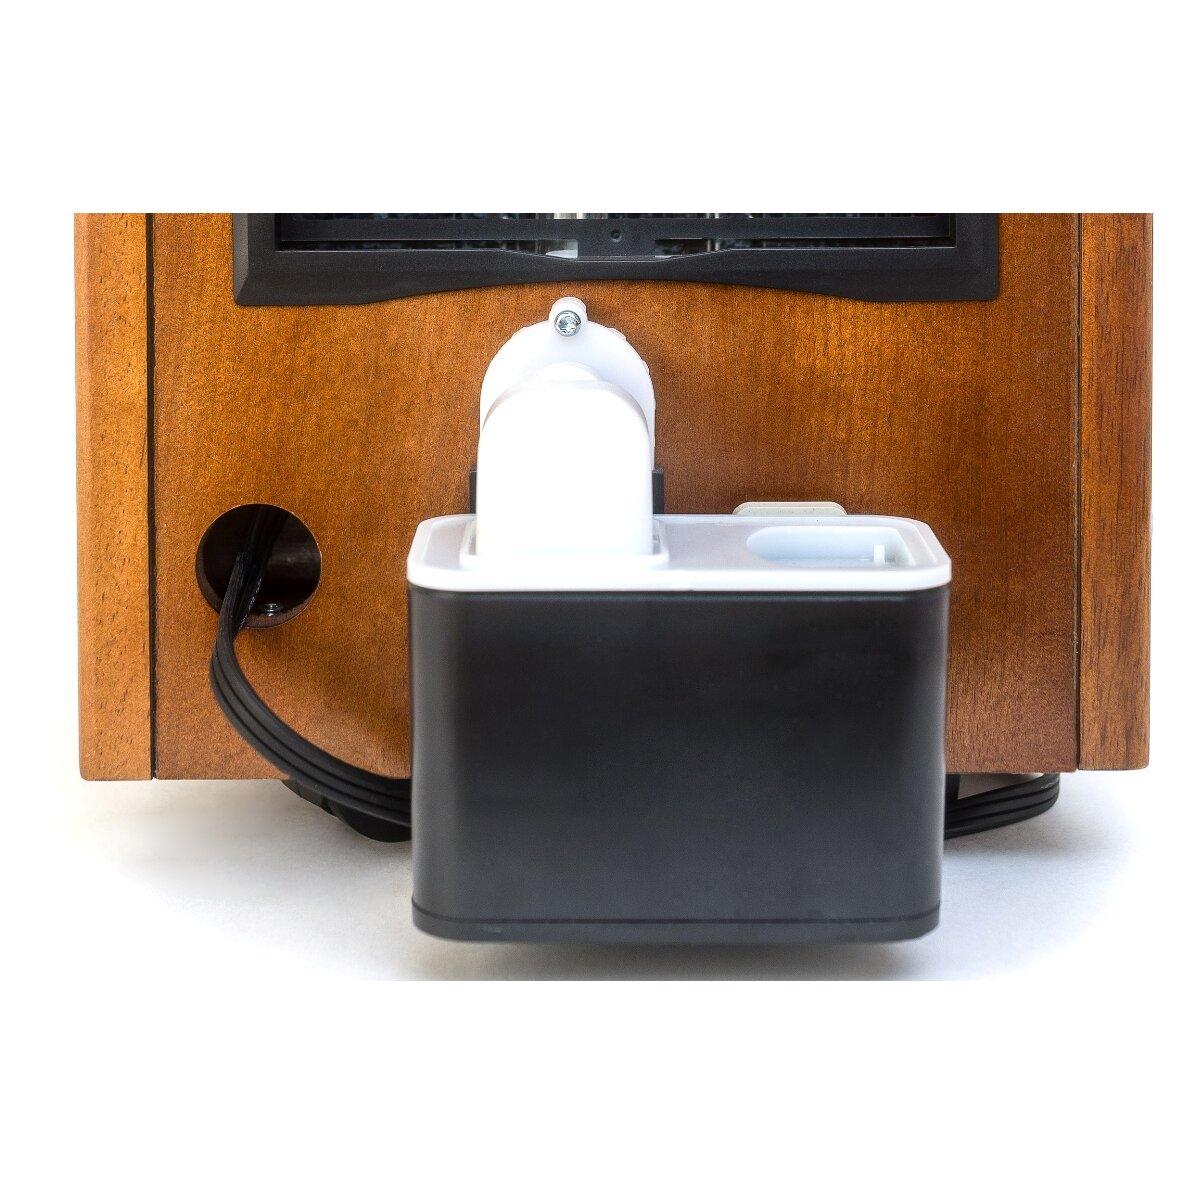 Dr. Infrared Heater Elite Series 1,500 Watt Portable Electric Infrared